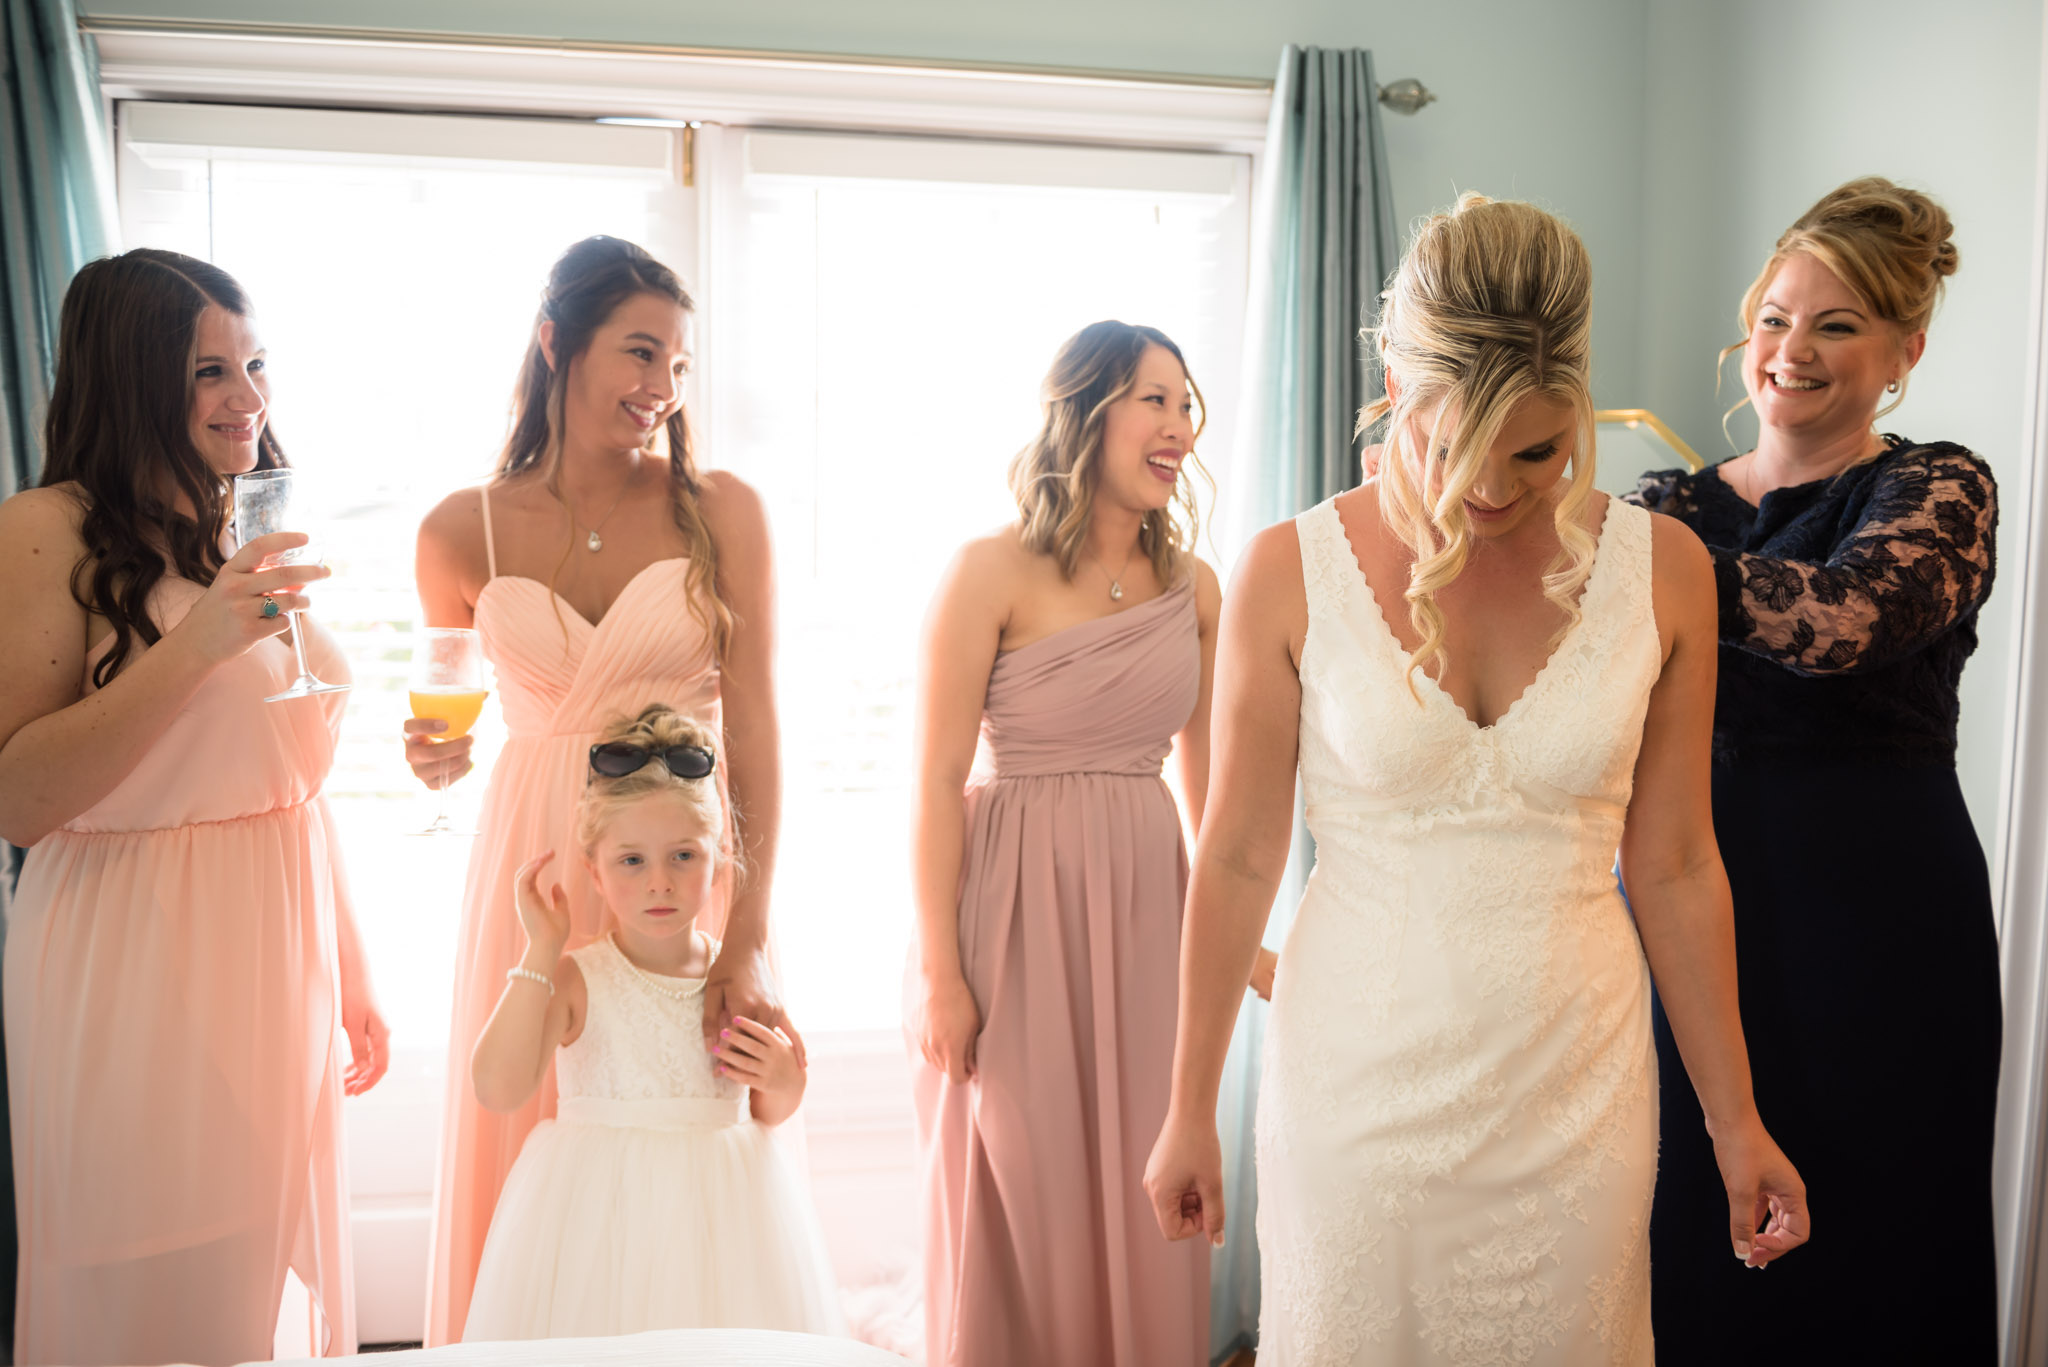 Avensole-Winery-Temecula-Wedding-Josh-and-Olivia-3077.JPG